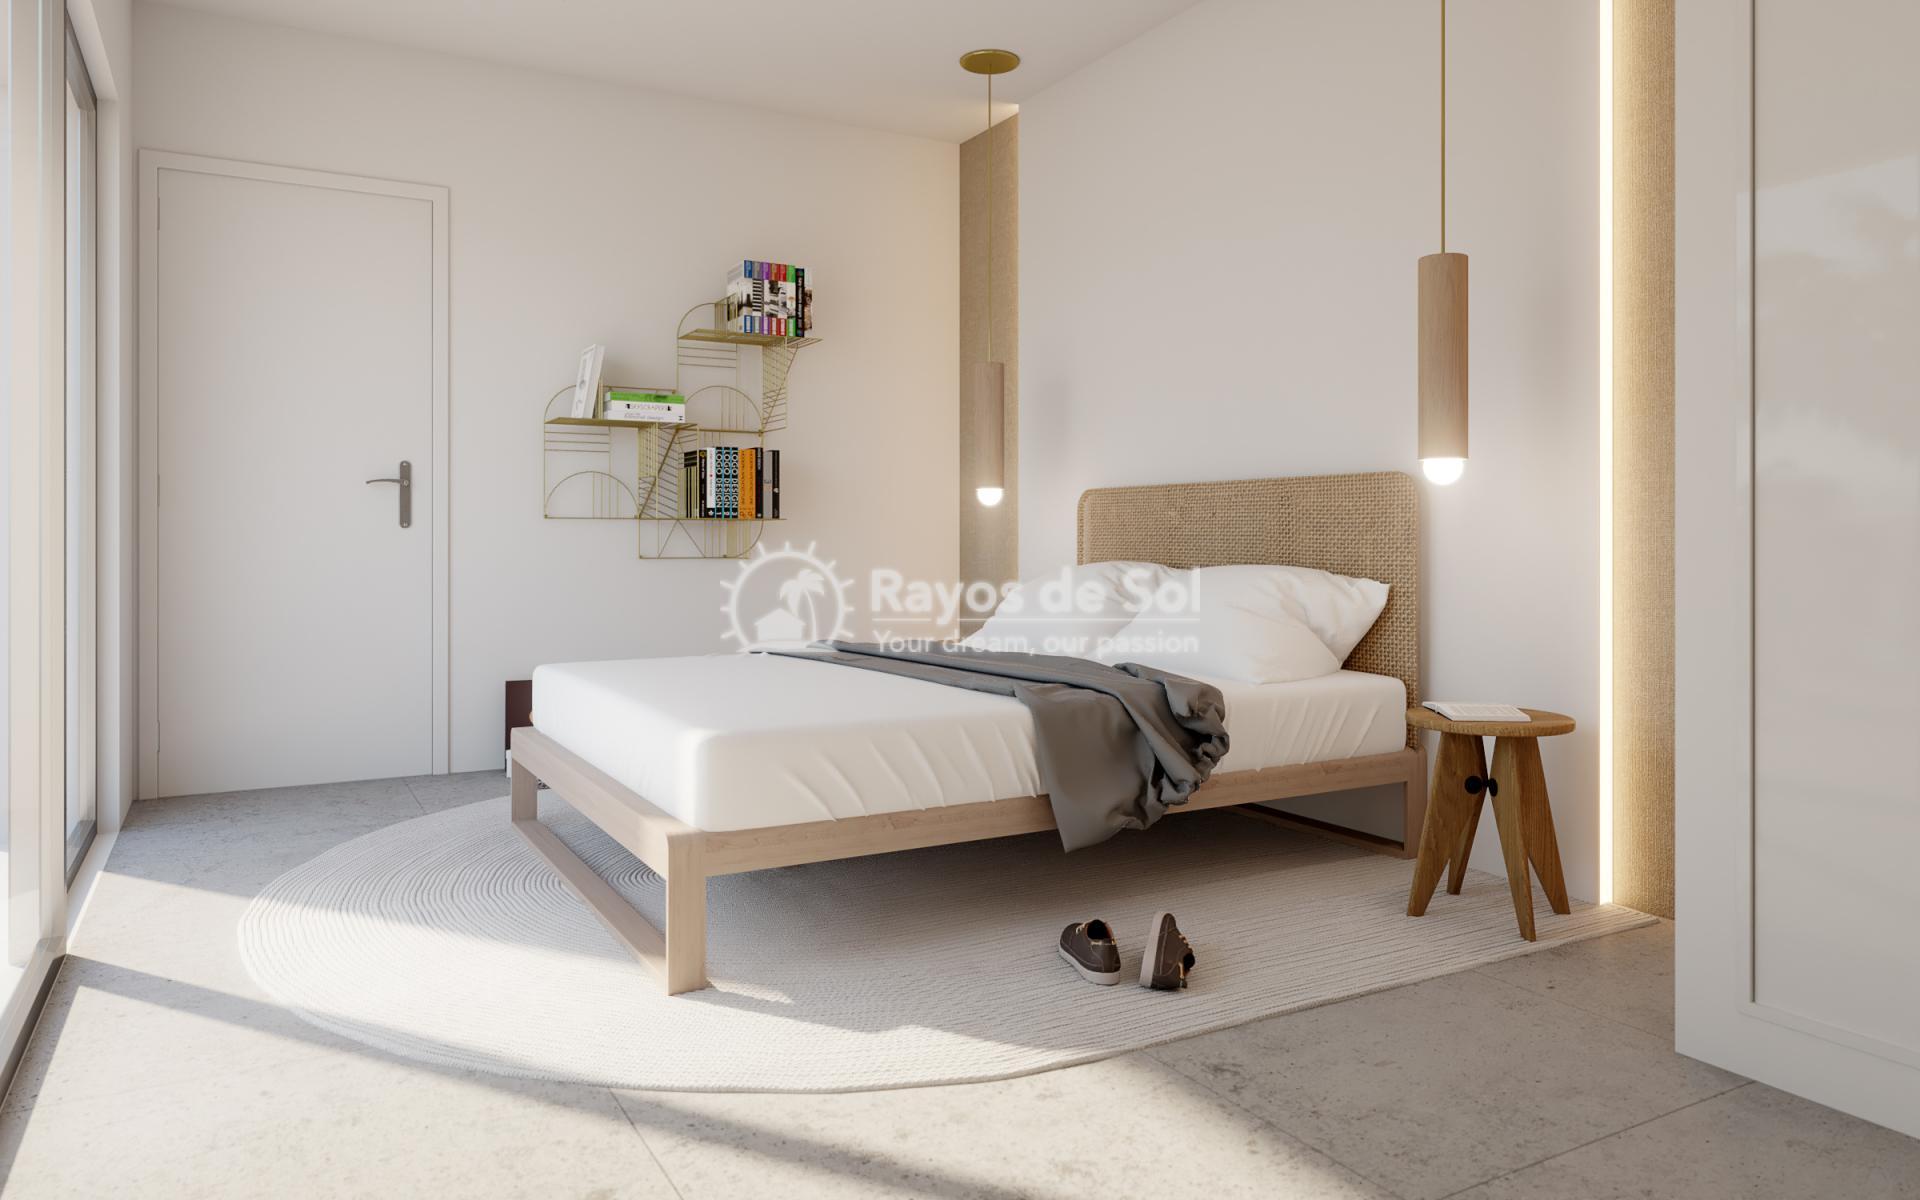 Luxury newbuild villa in La Finca Golf, Algorfa, Costa Blanca (LFPADI) - 15